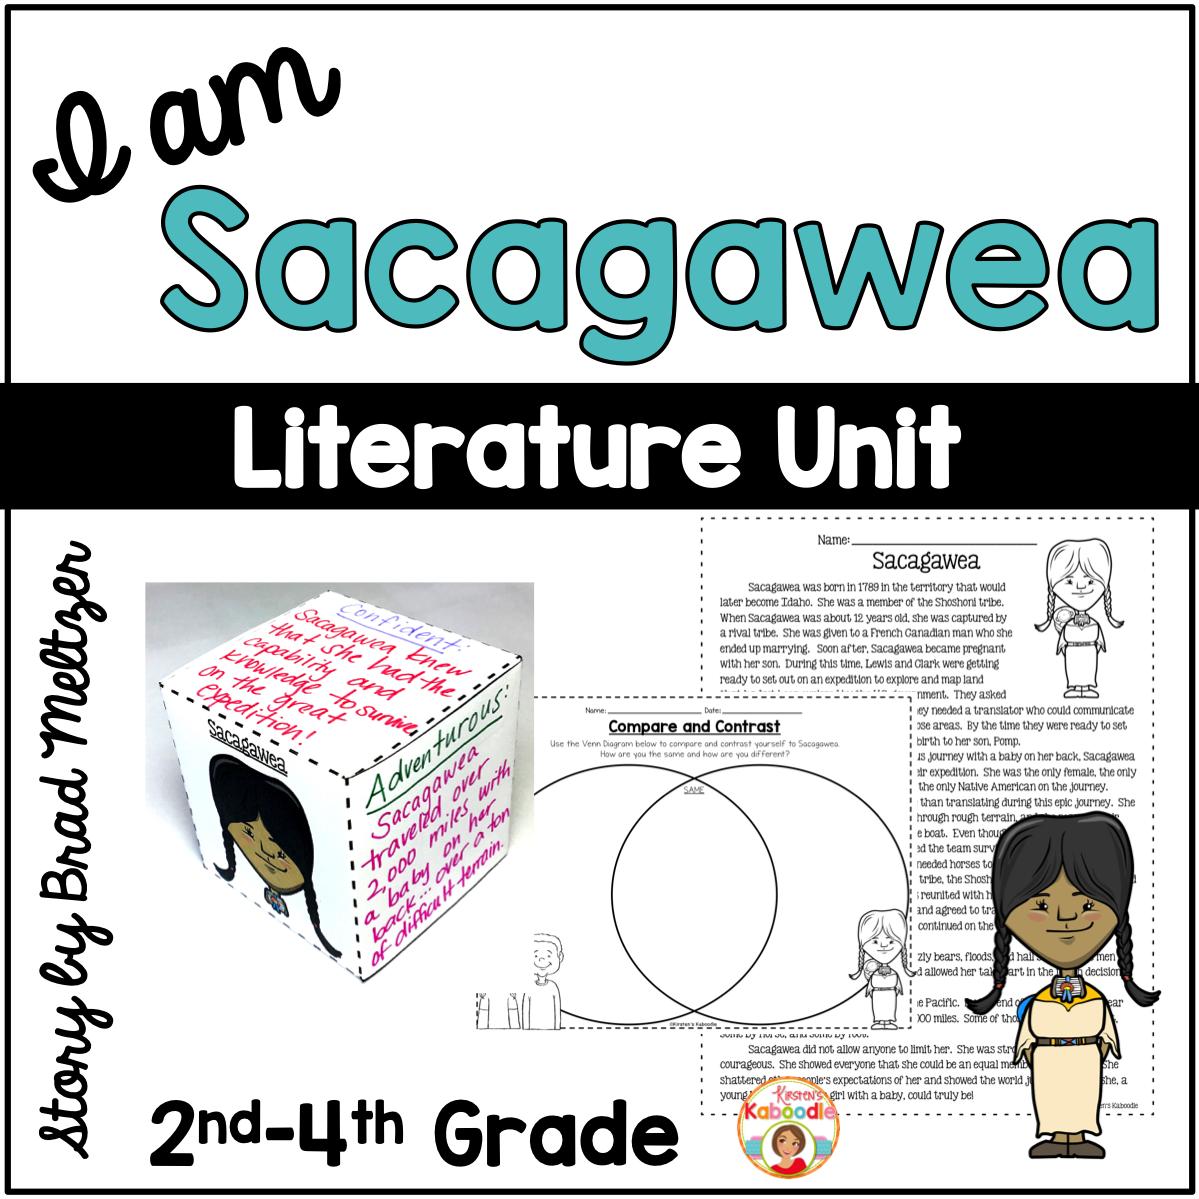 I am Sacagawea by Brad Meltzer Literature Unit Activities